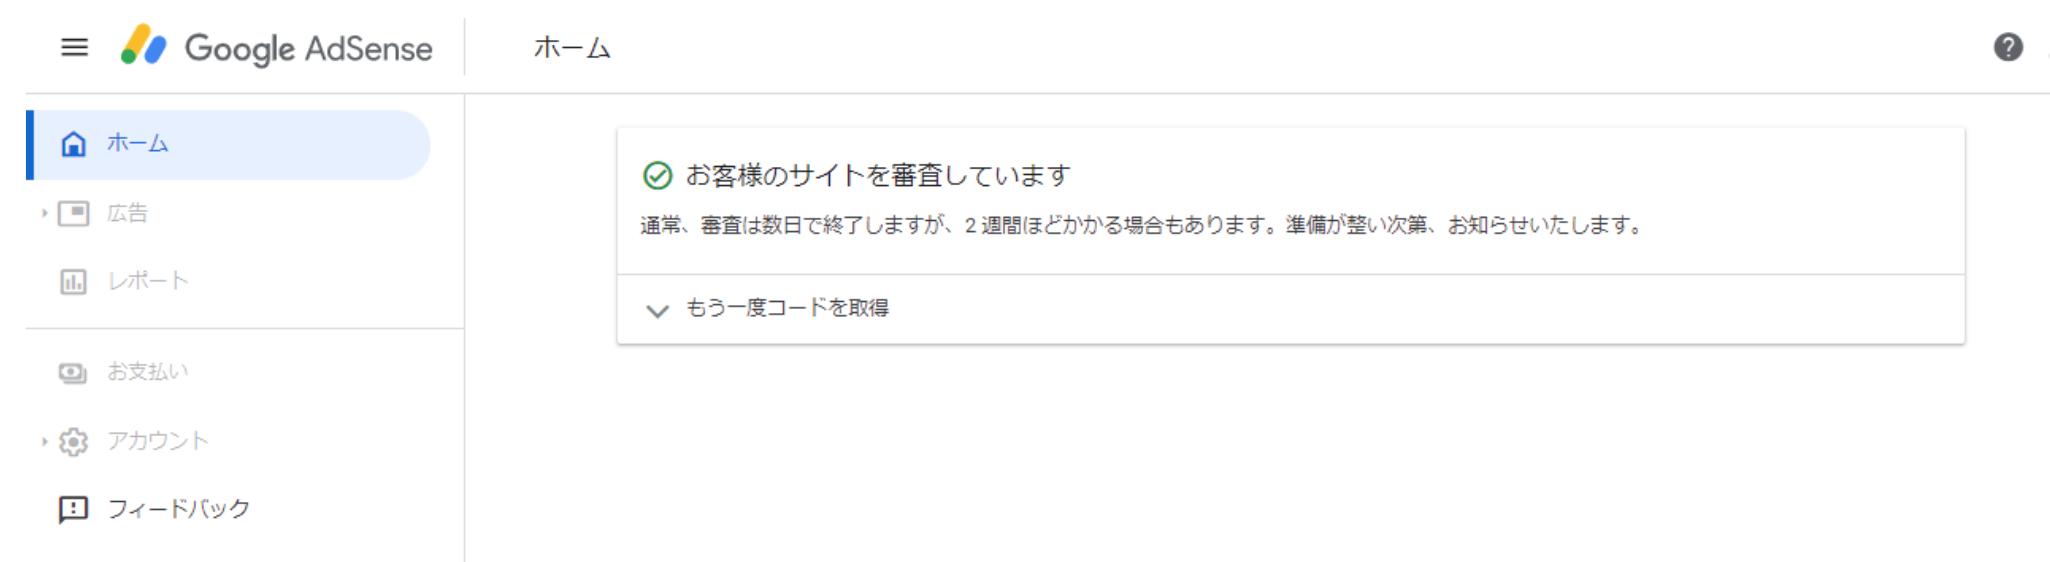 Googleアドセンス申請待ちの画像